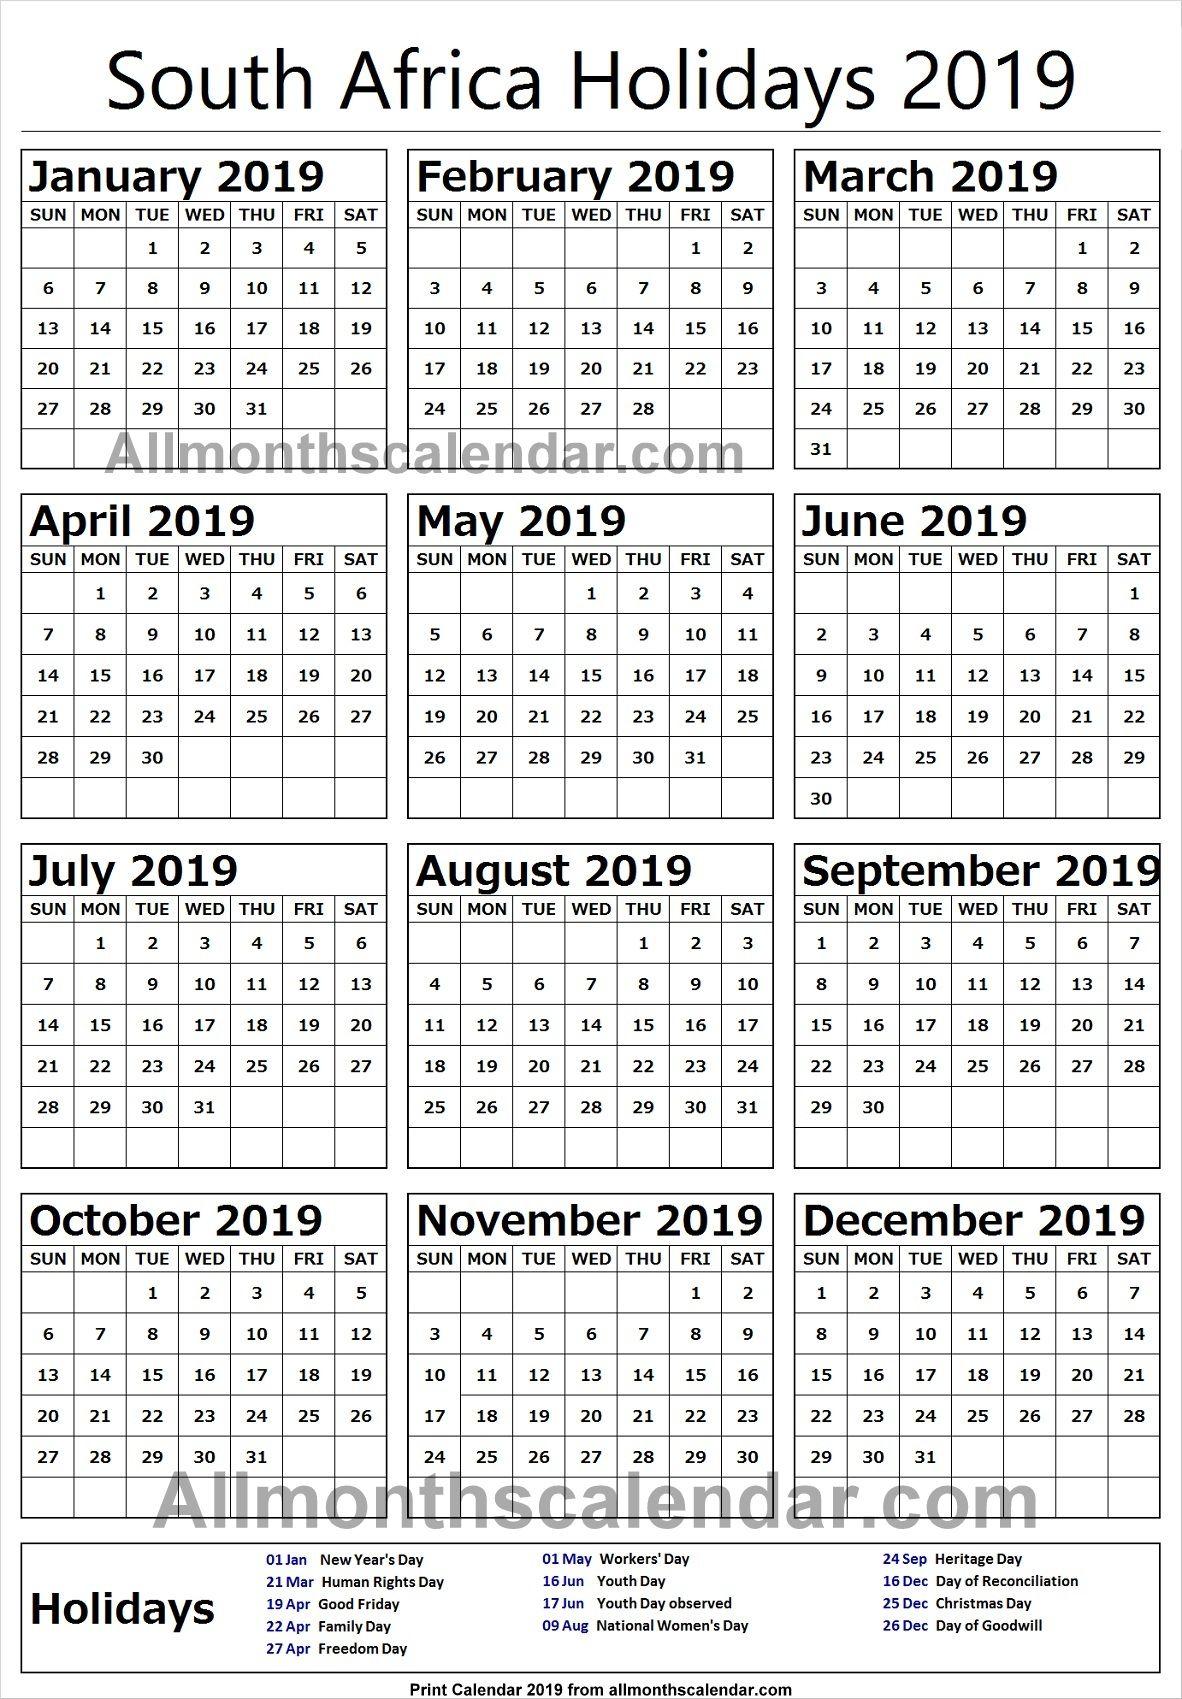 South Africa Holiday List 2019 South Africa Holidays Marketing Calendar Template Ramadan In Saudi Arabia